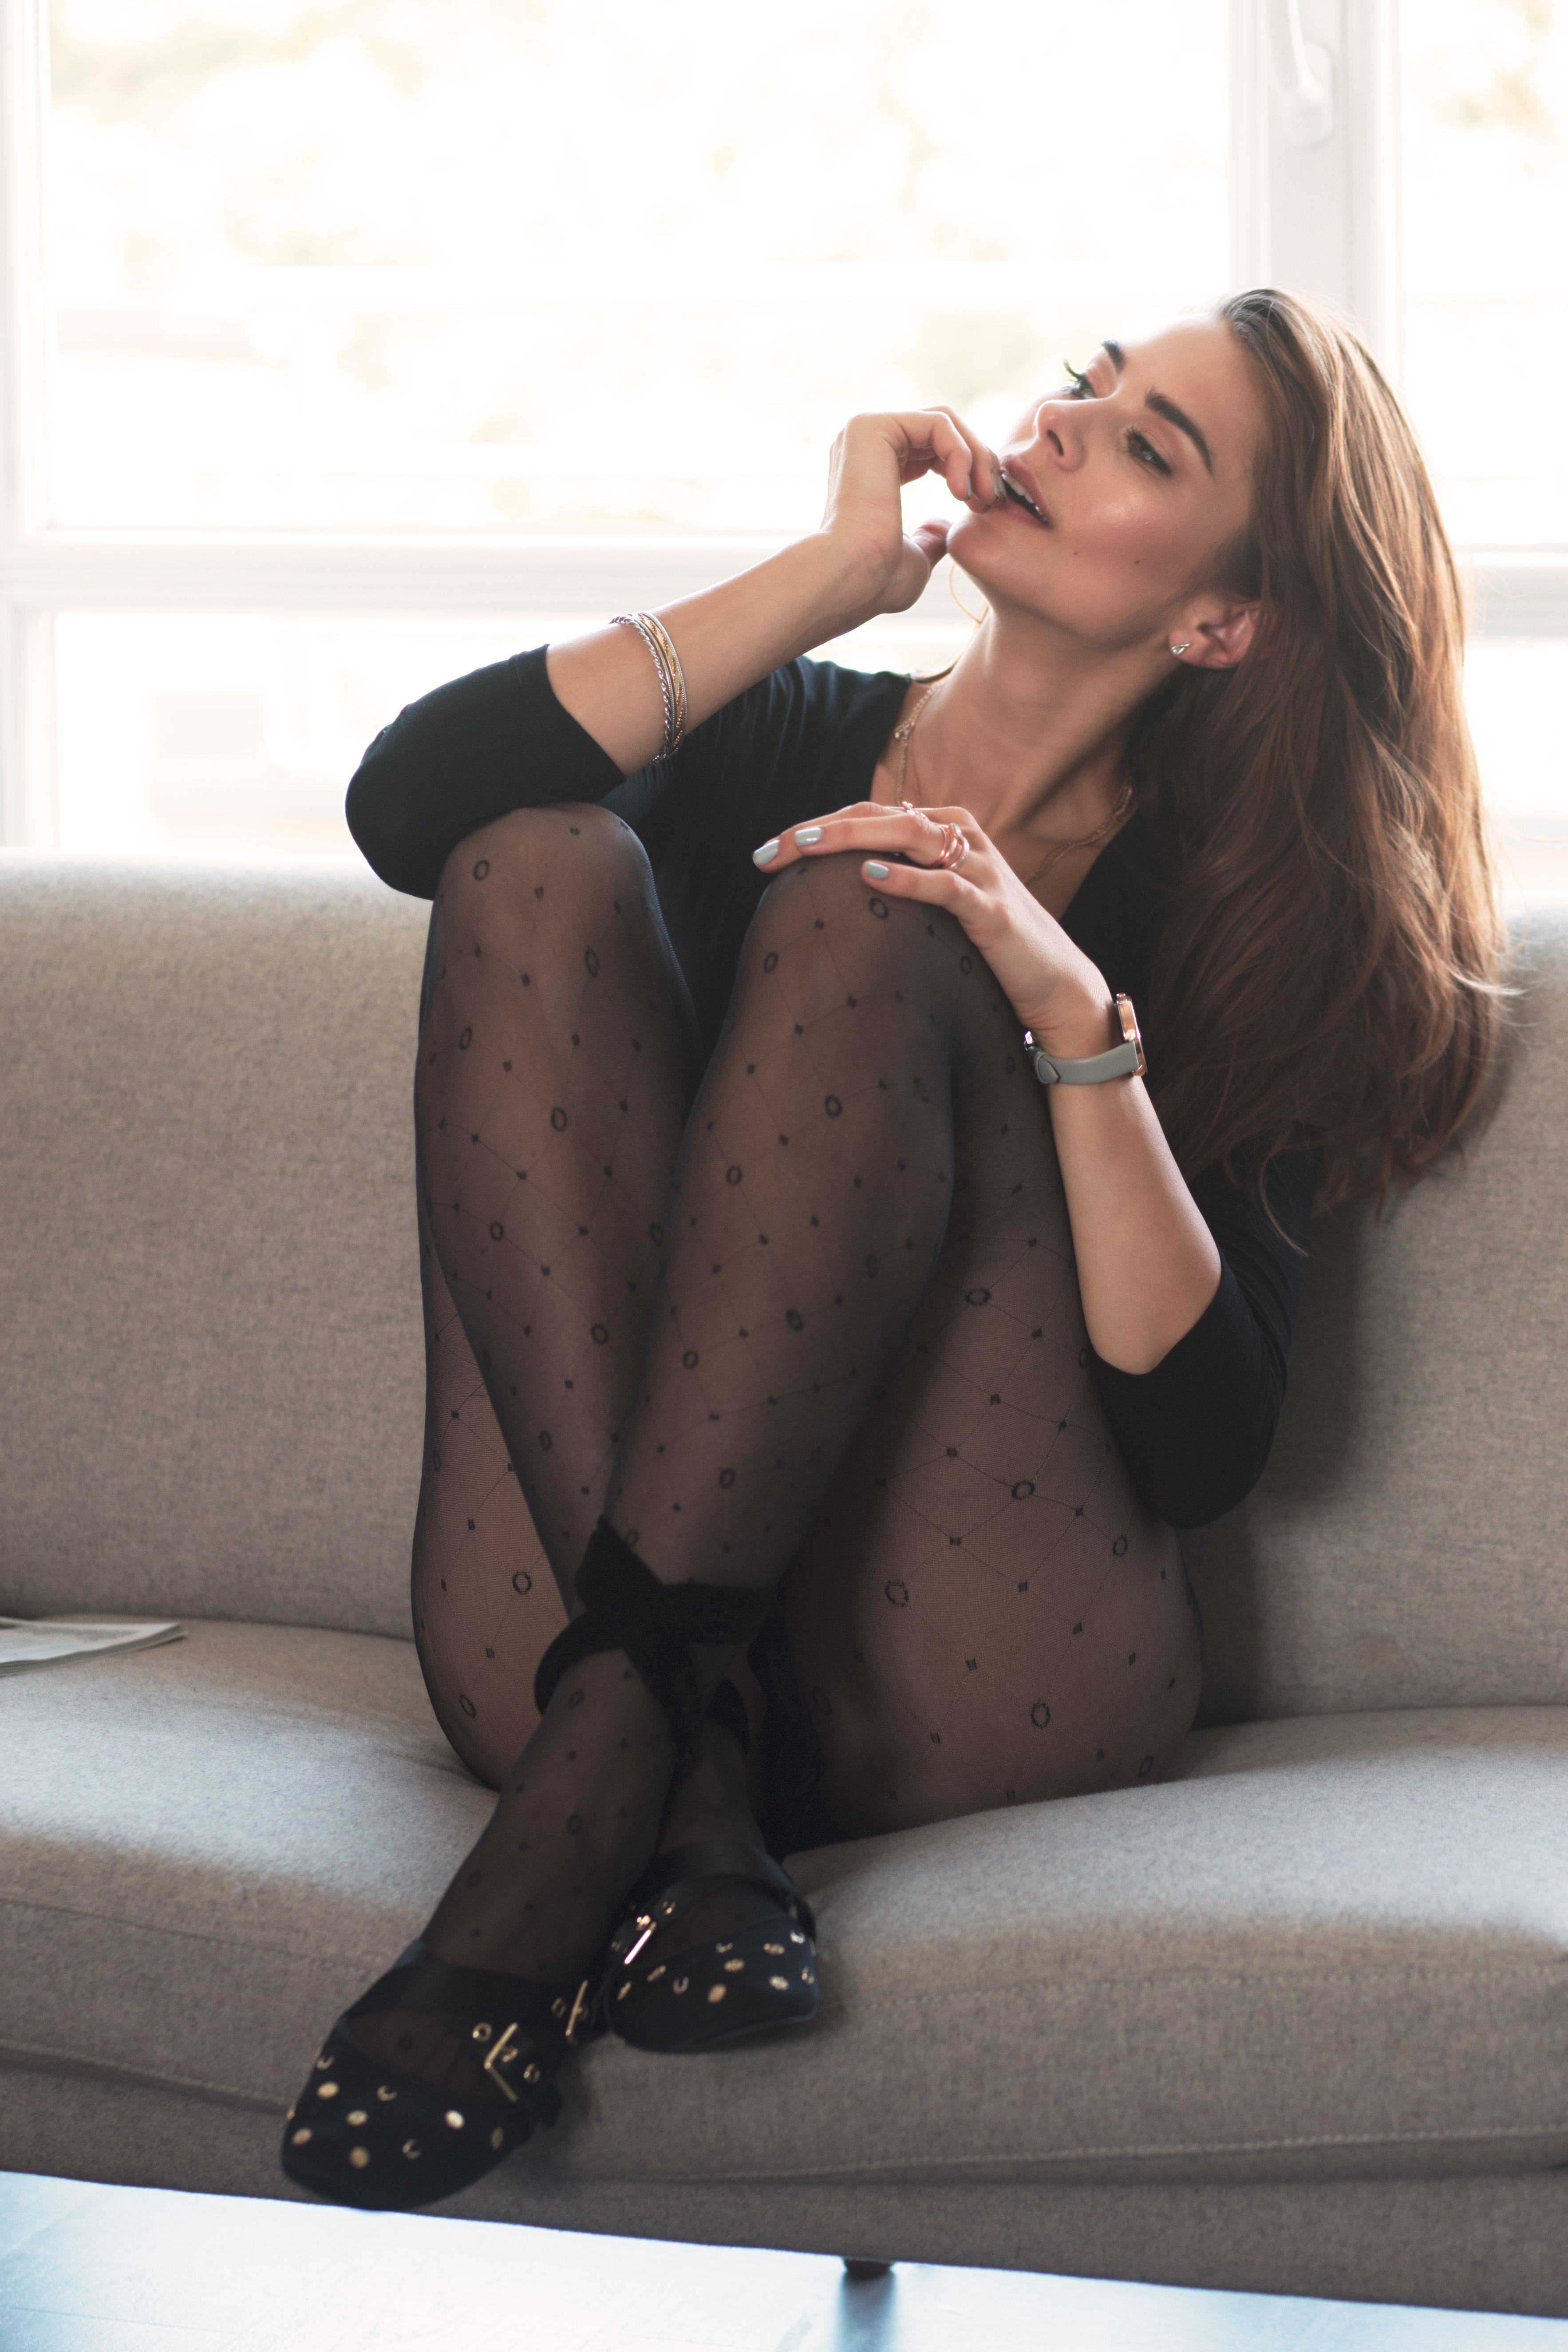 64d099c40971de #Gatta #GattaWoman #LexAvenue #GattaRoyale #GattaLexAvenue #autumnwinter  #newcollection #polishbrand #beautiful #pretty #trend #tights #legs #moda  #trendy # ...